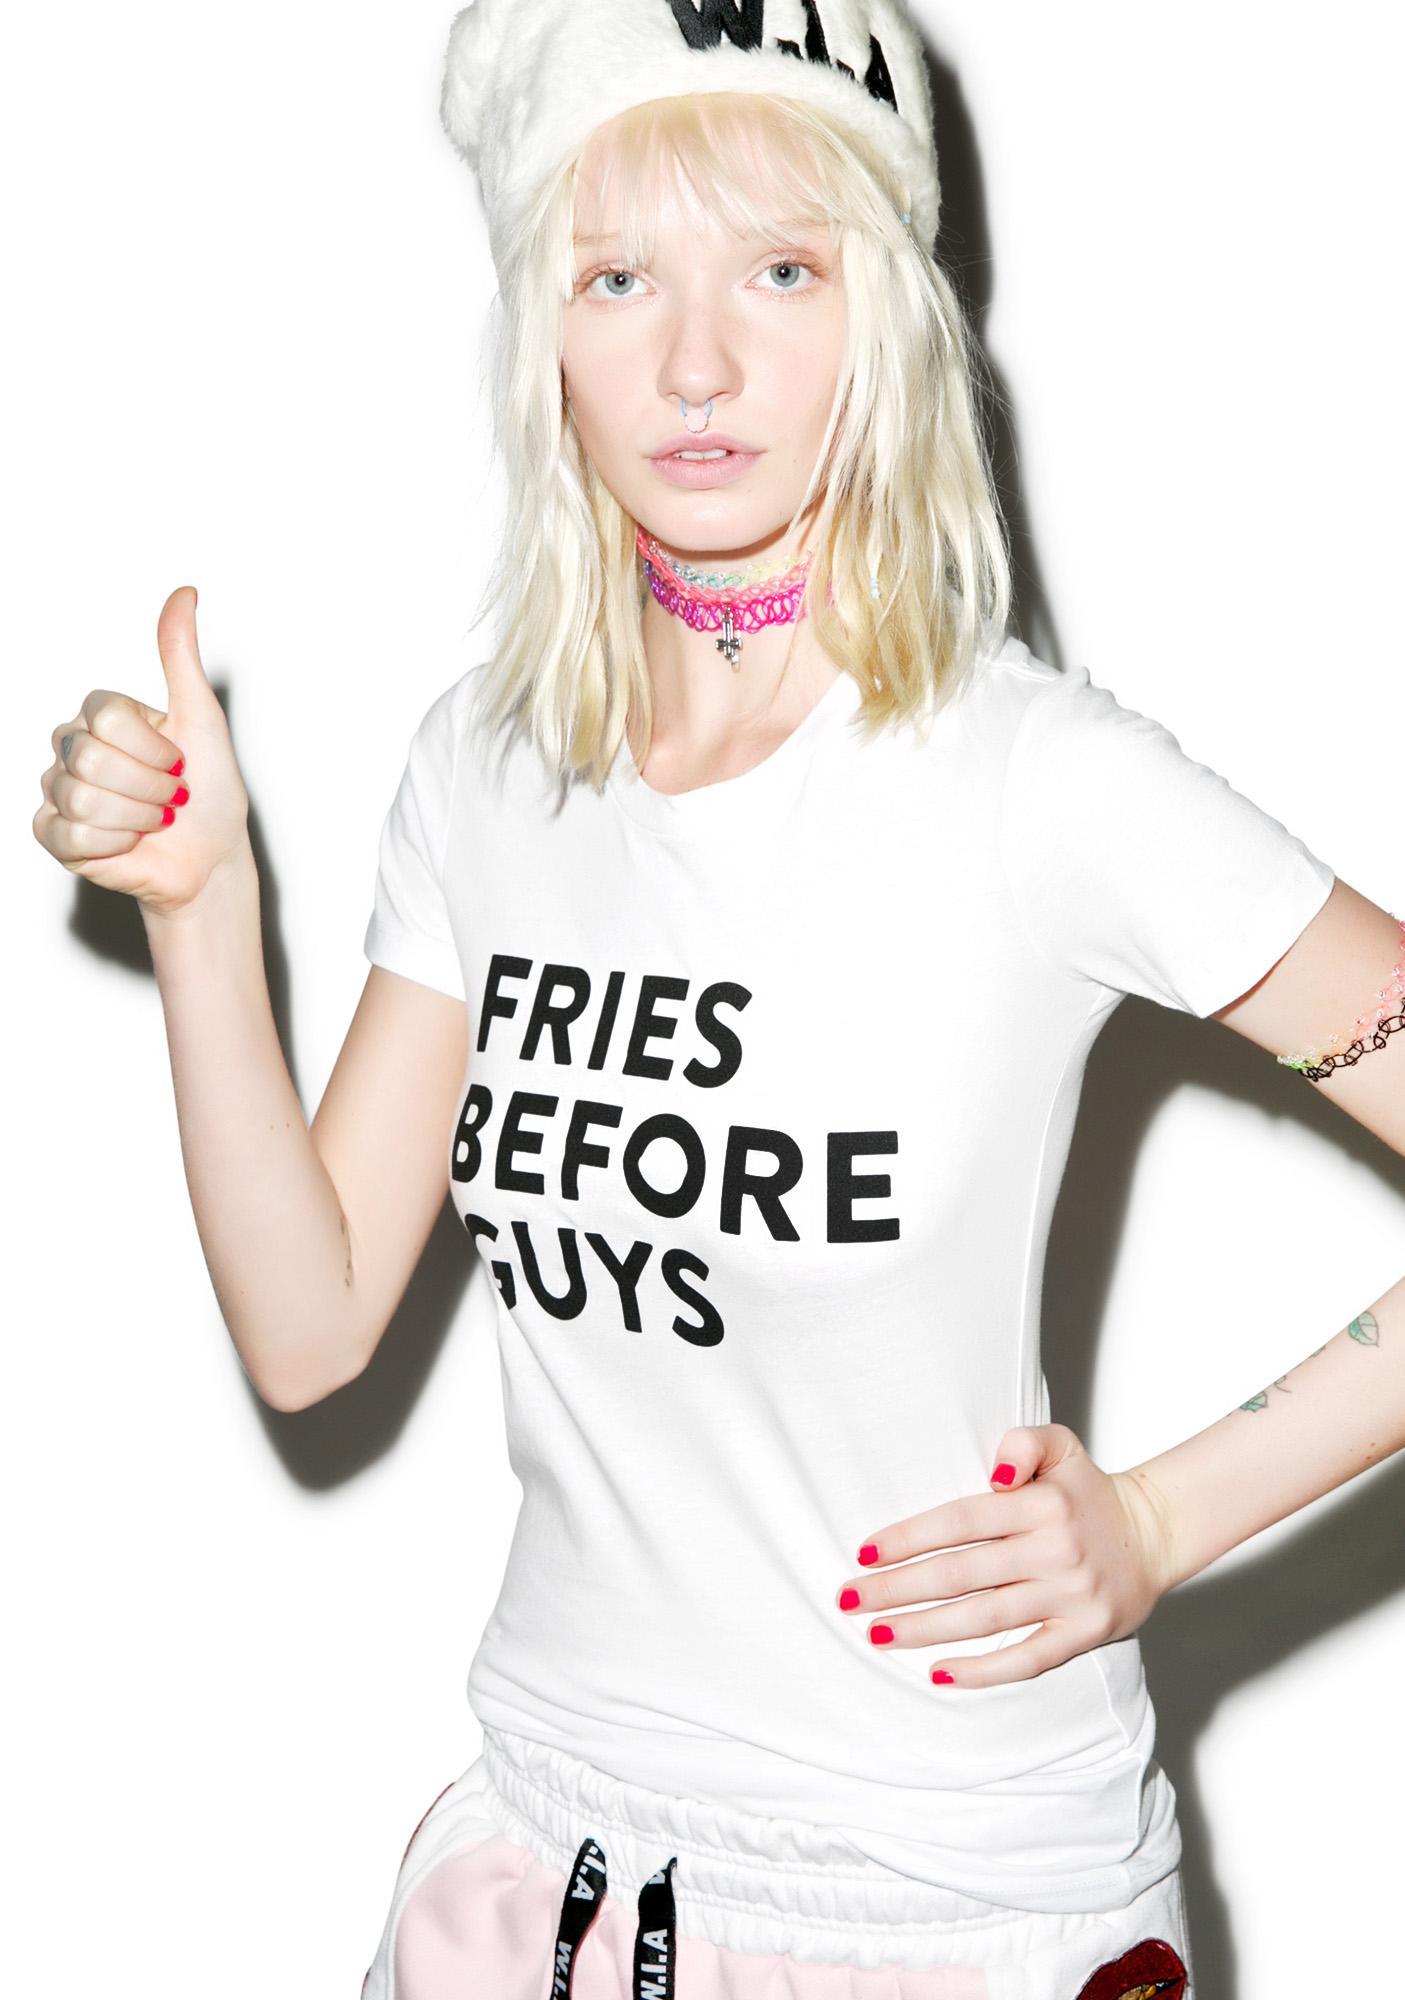 Barber Fries Before Guys Tee